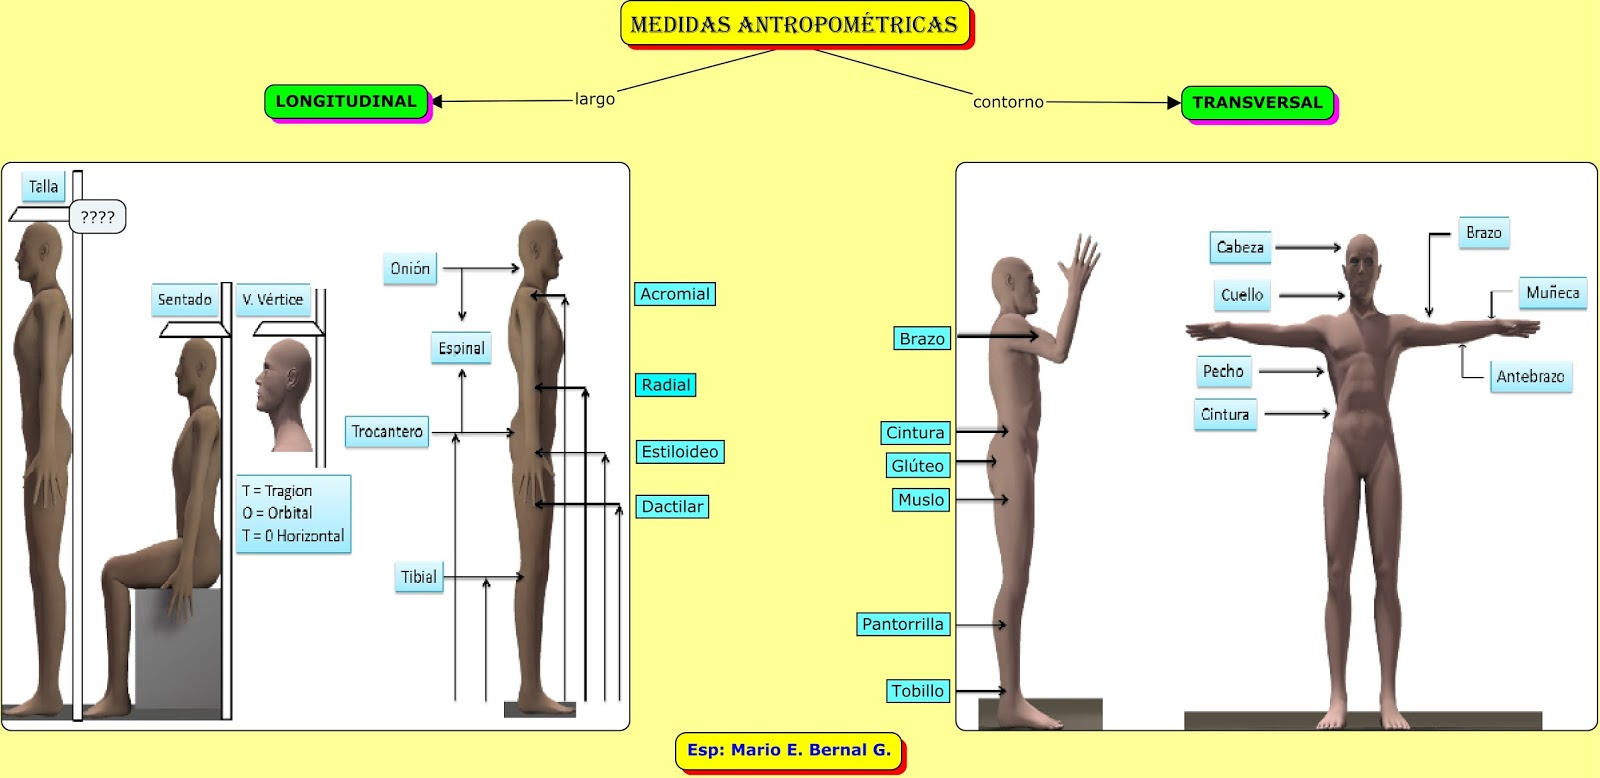 Q son las medidas antropometricas